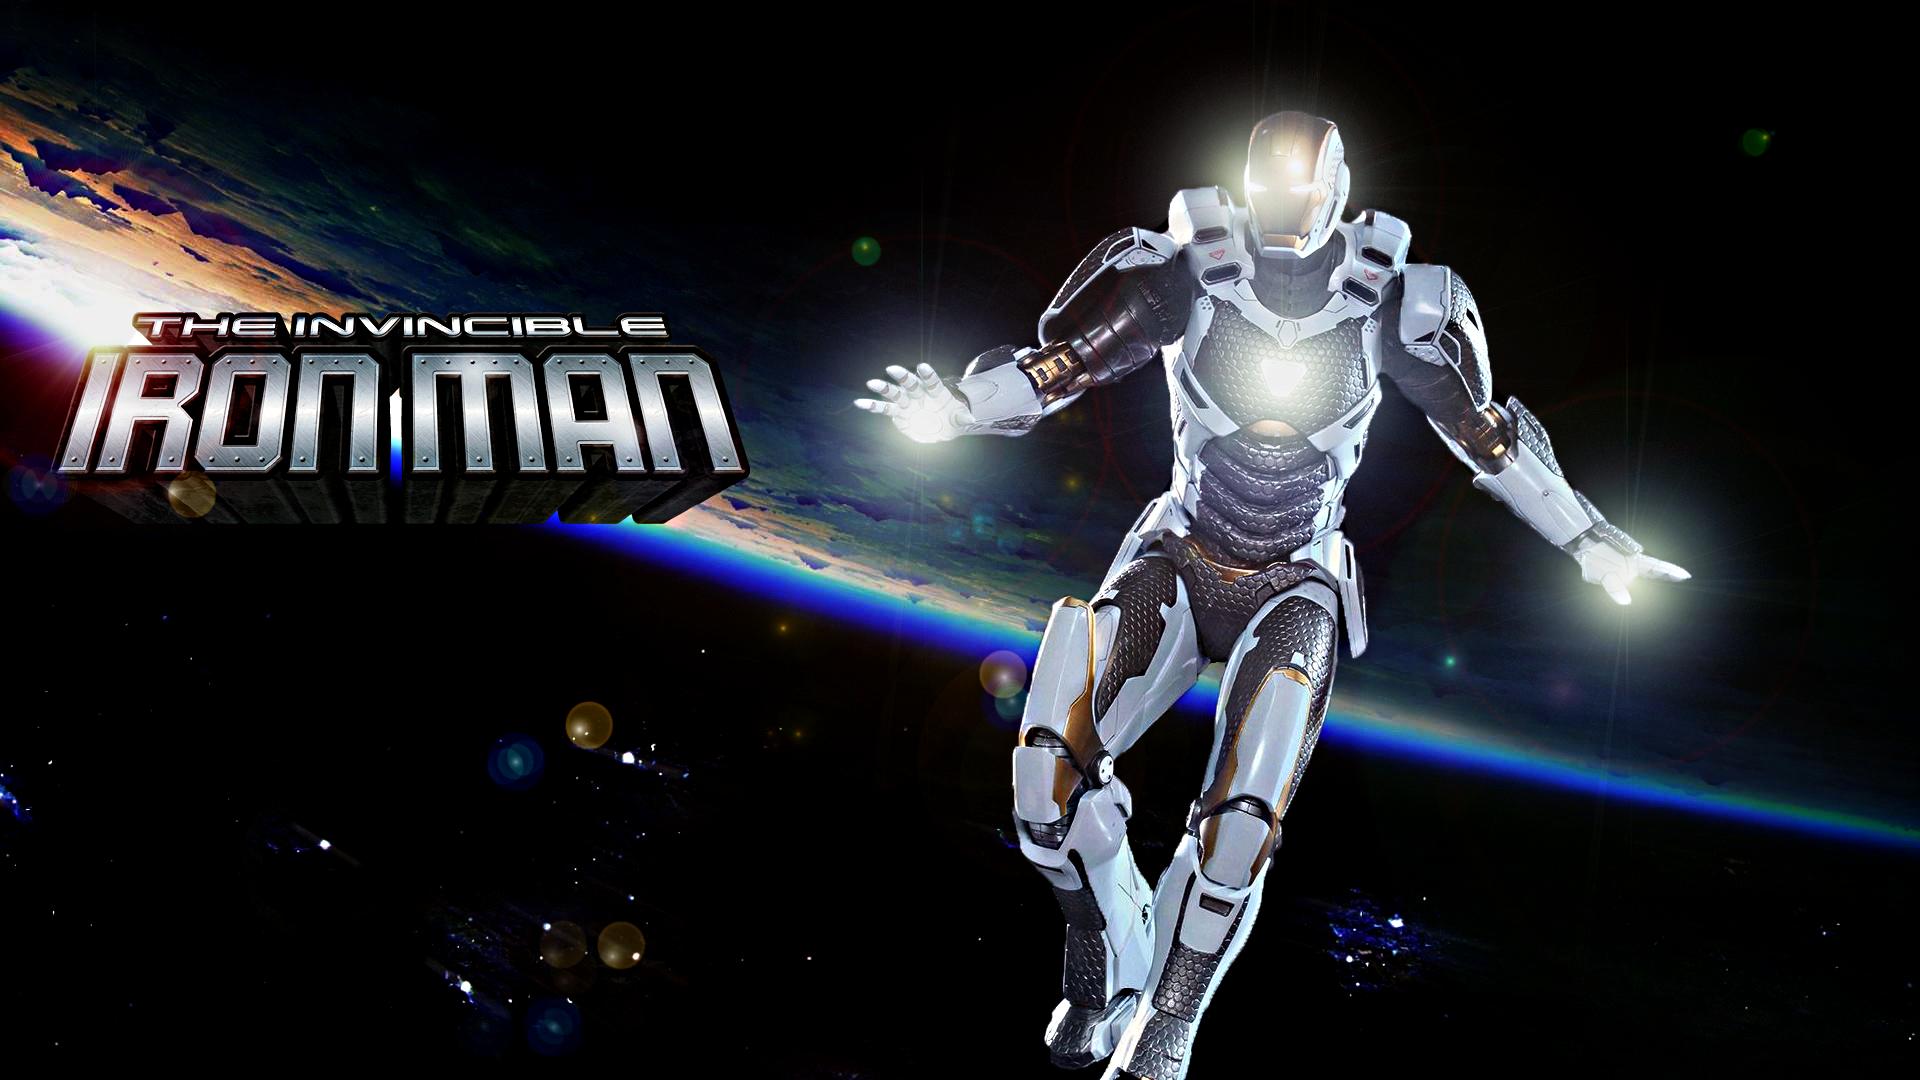 The Invincible Iron Man #Starboost by ProfessorAdagio